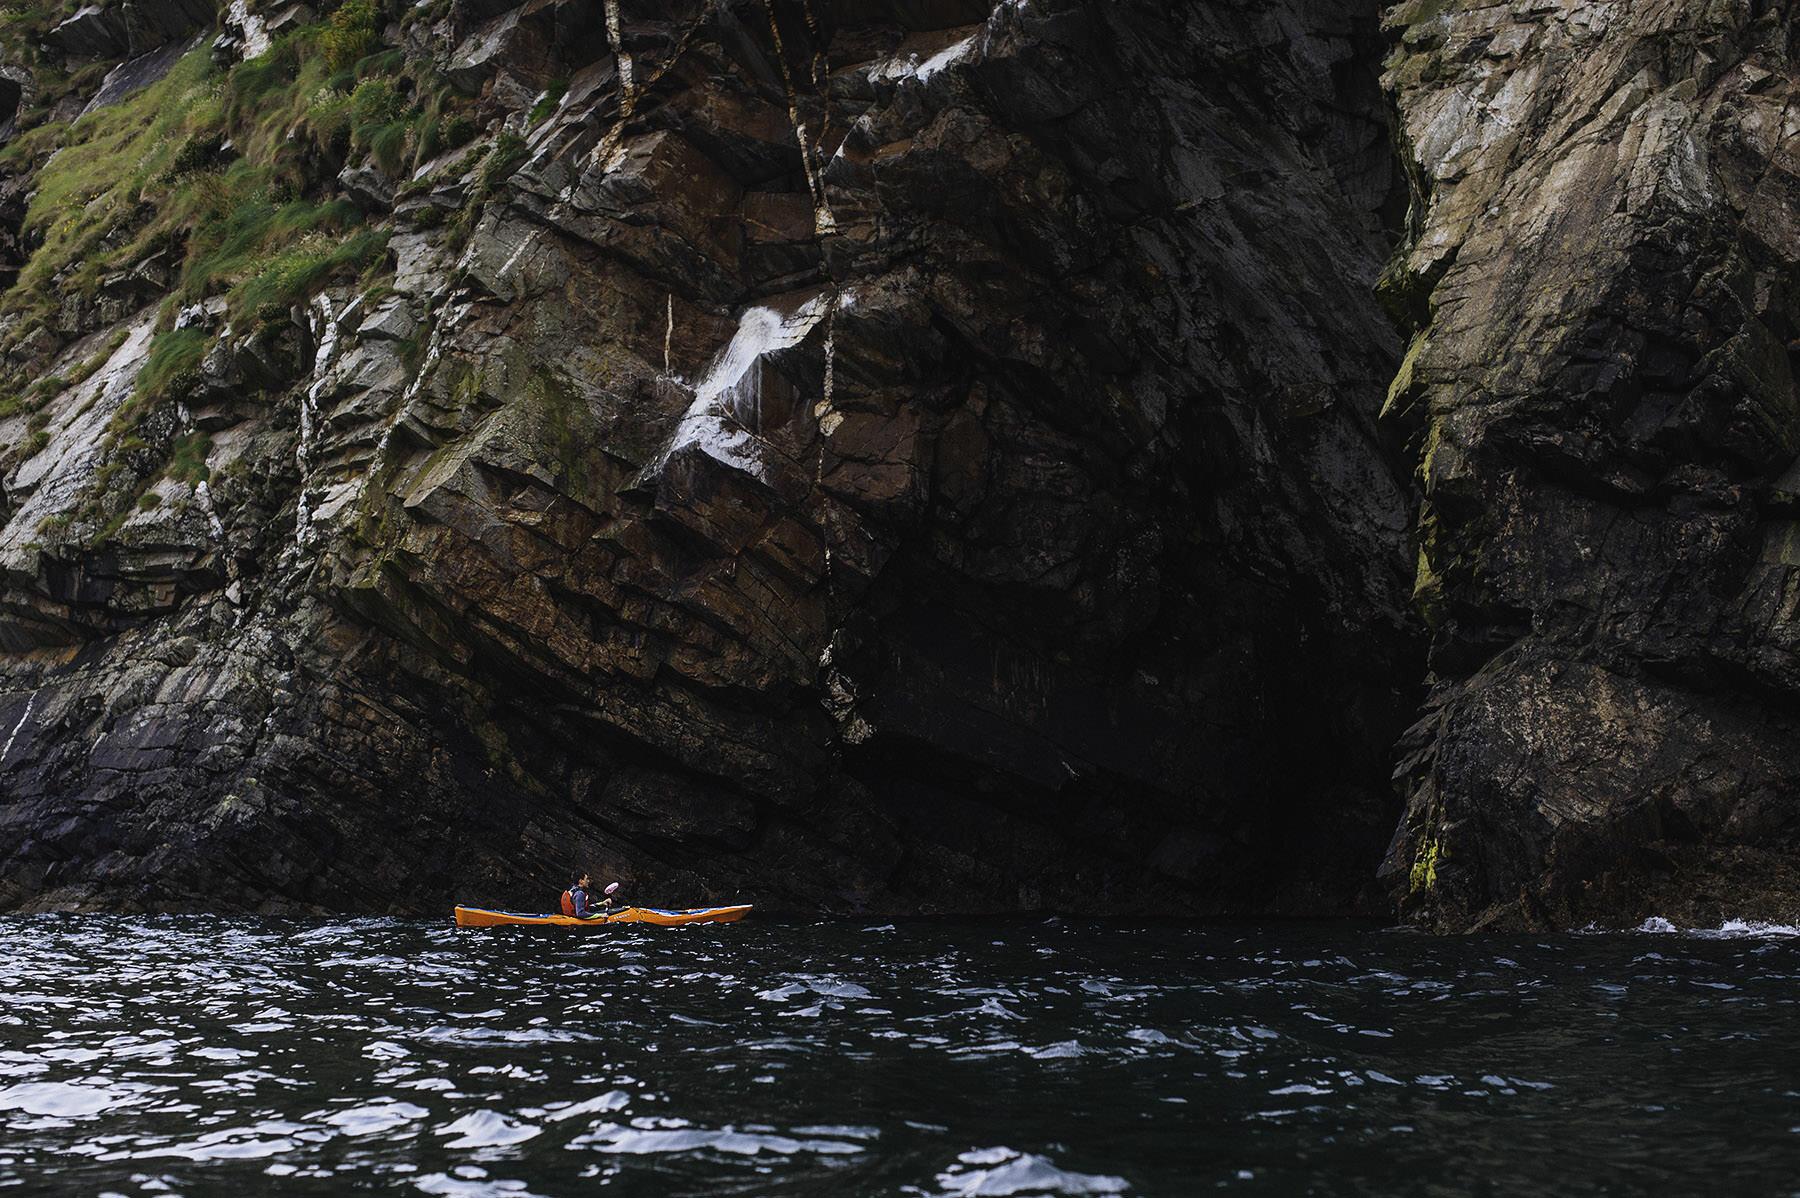 outdoor-adventure-sea-kayaking-ireland-fort-dunree.jpg